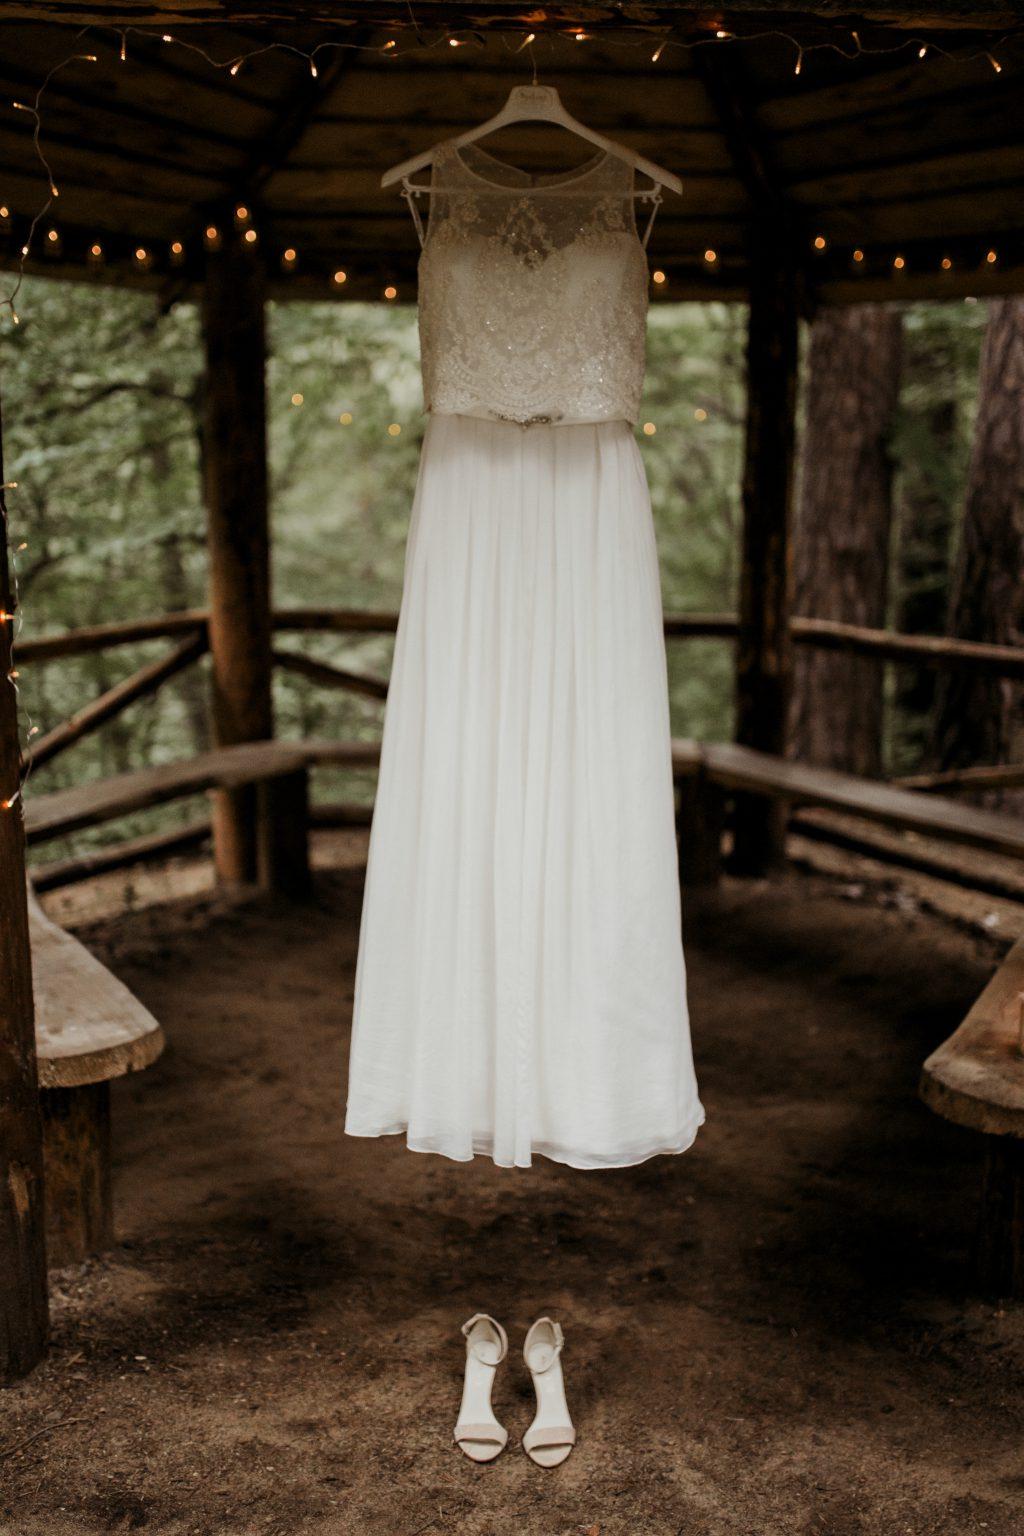 Wedding dress 3 - free stock photo